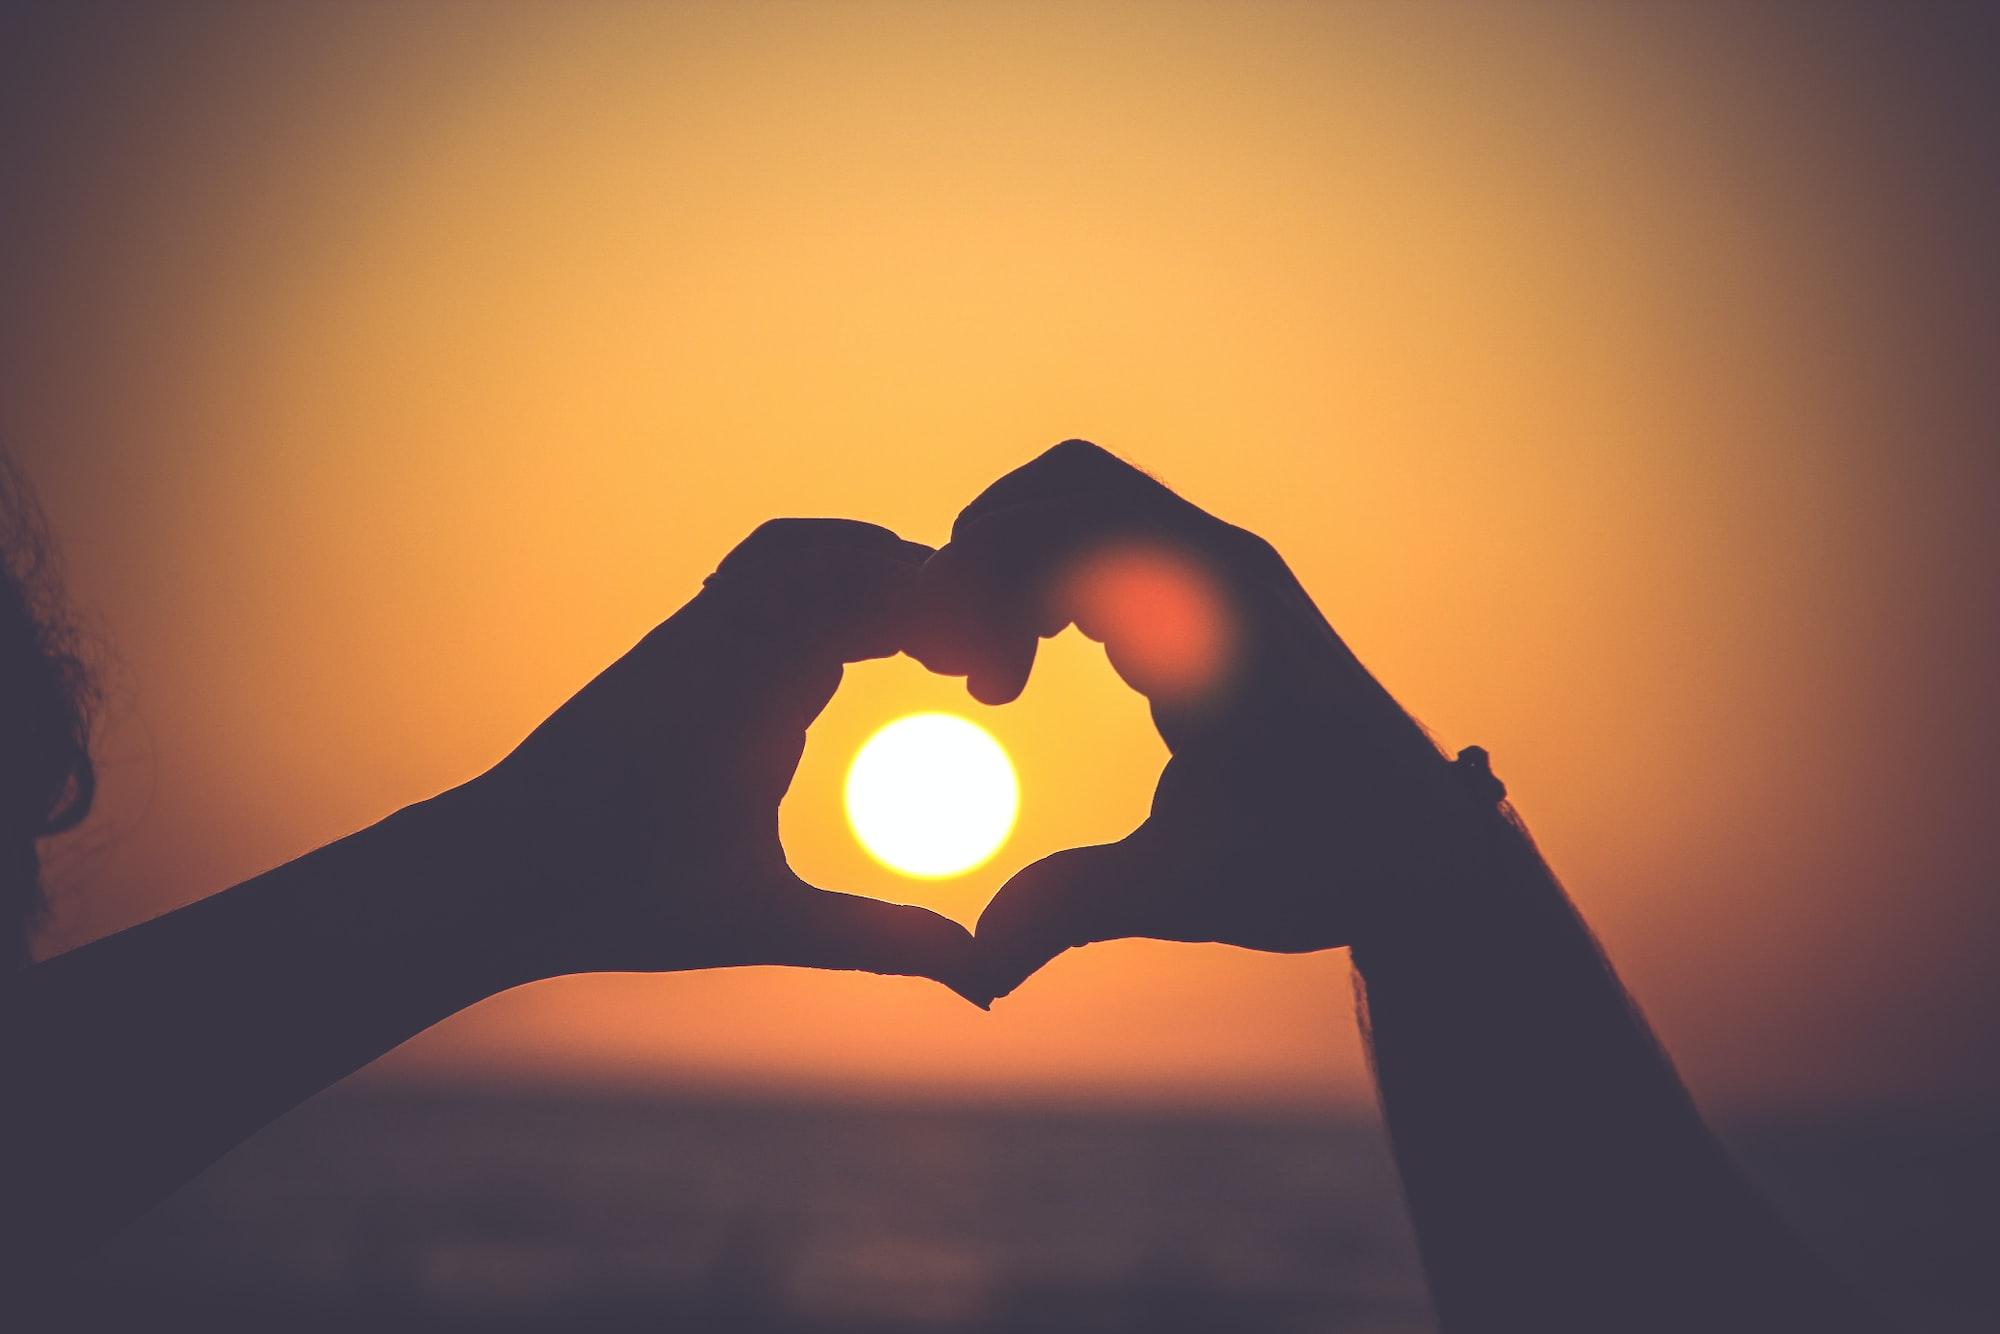 Love under setting sun